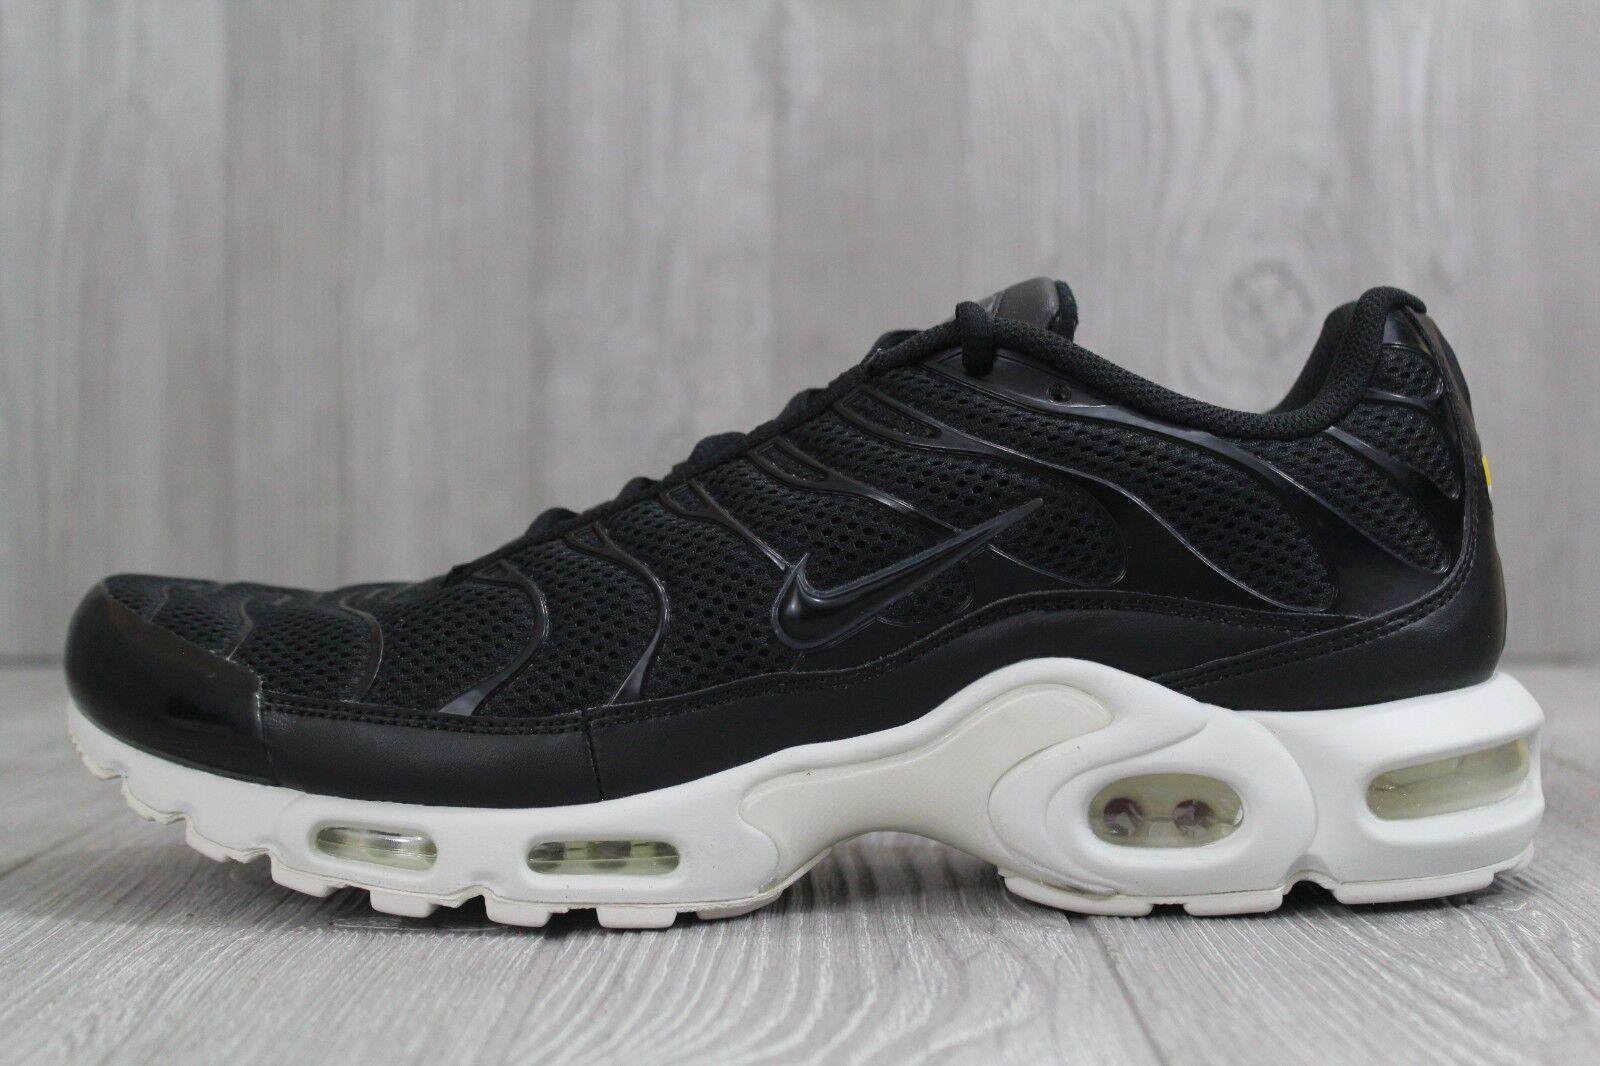 a5c86efa6e5c1 Nike Air Max Plus TN Ultra Mens 898015-001 Black Grey Running Shoes ...